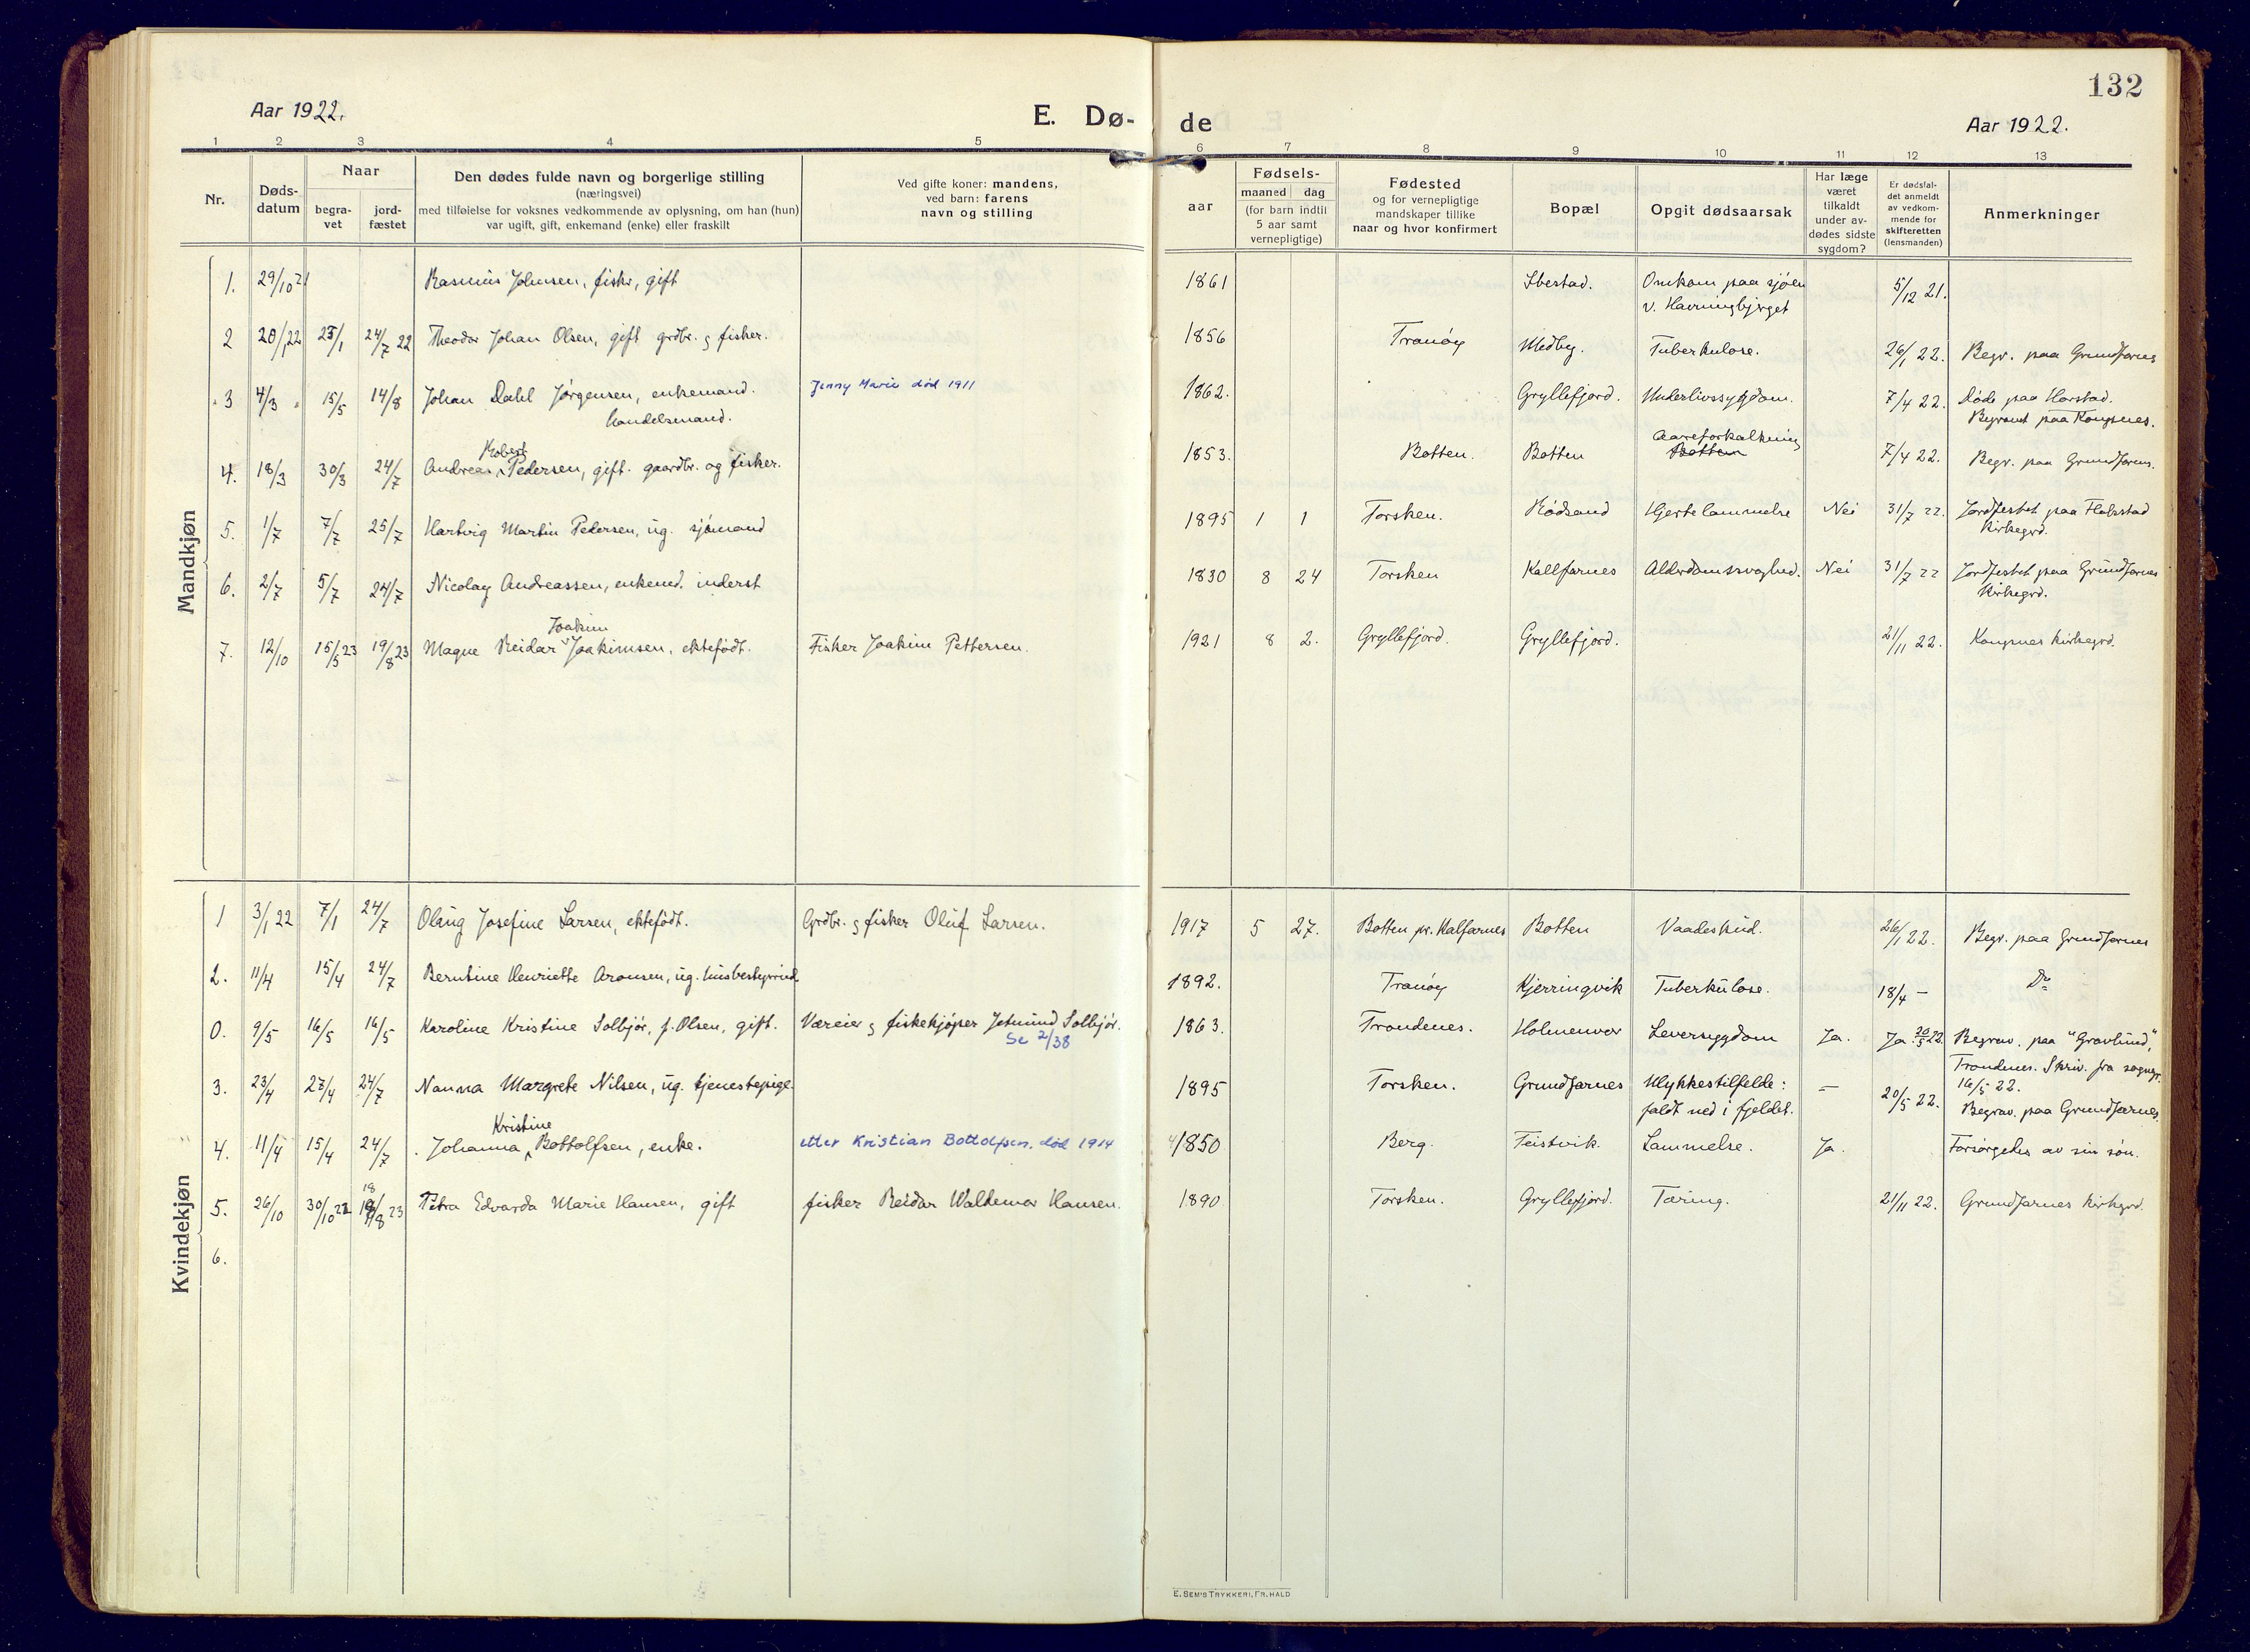 SATØ, Mefjord/Berg sokneprestkontor, G/Ga/Gaa: Ministerialbok nr. 10, 1916-1928, s. 132